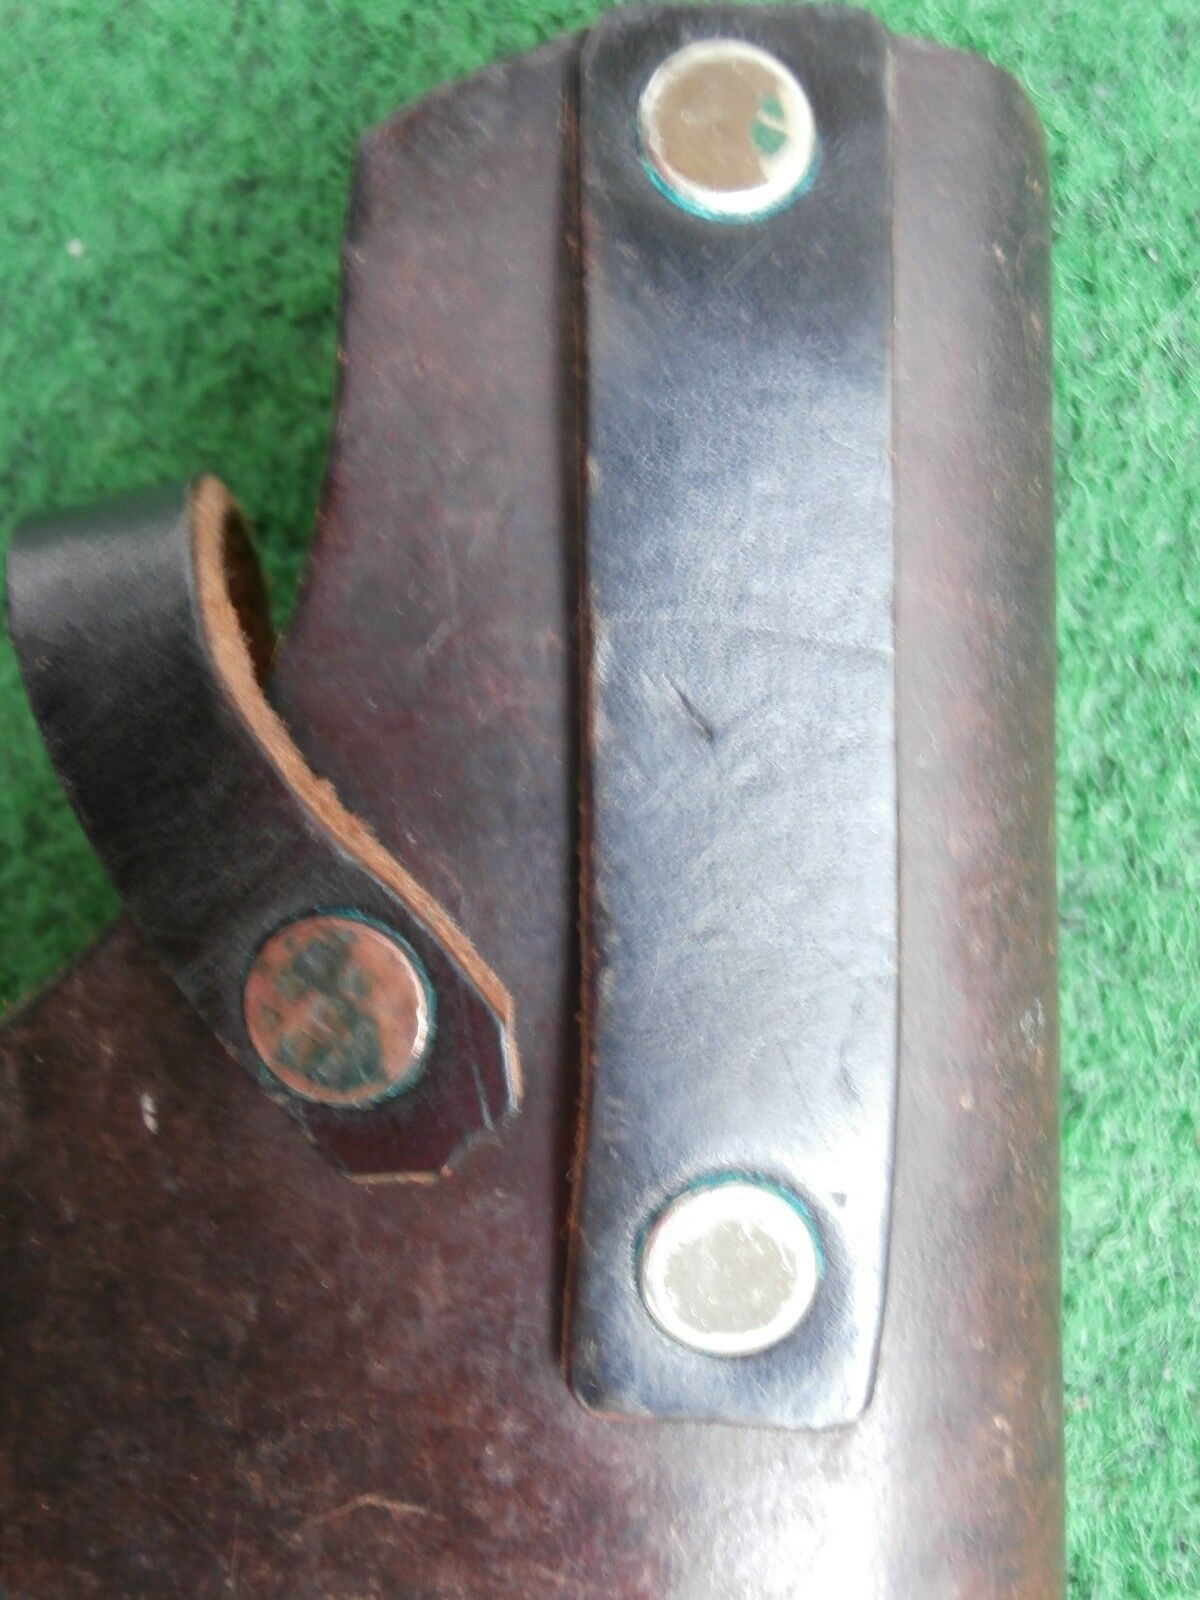 Holster Lederholster Gürtelholster Gürtelholster Gürtelholster mit Schlaufe b01744